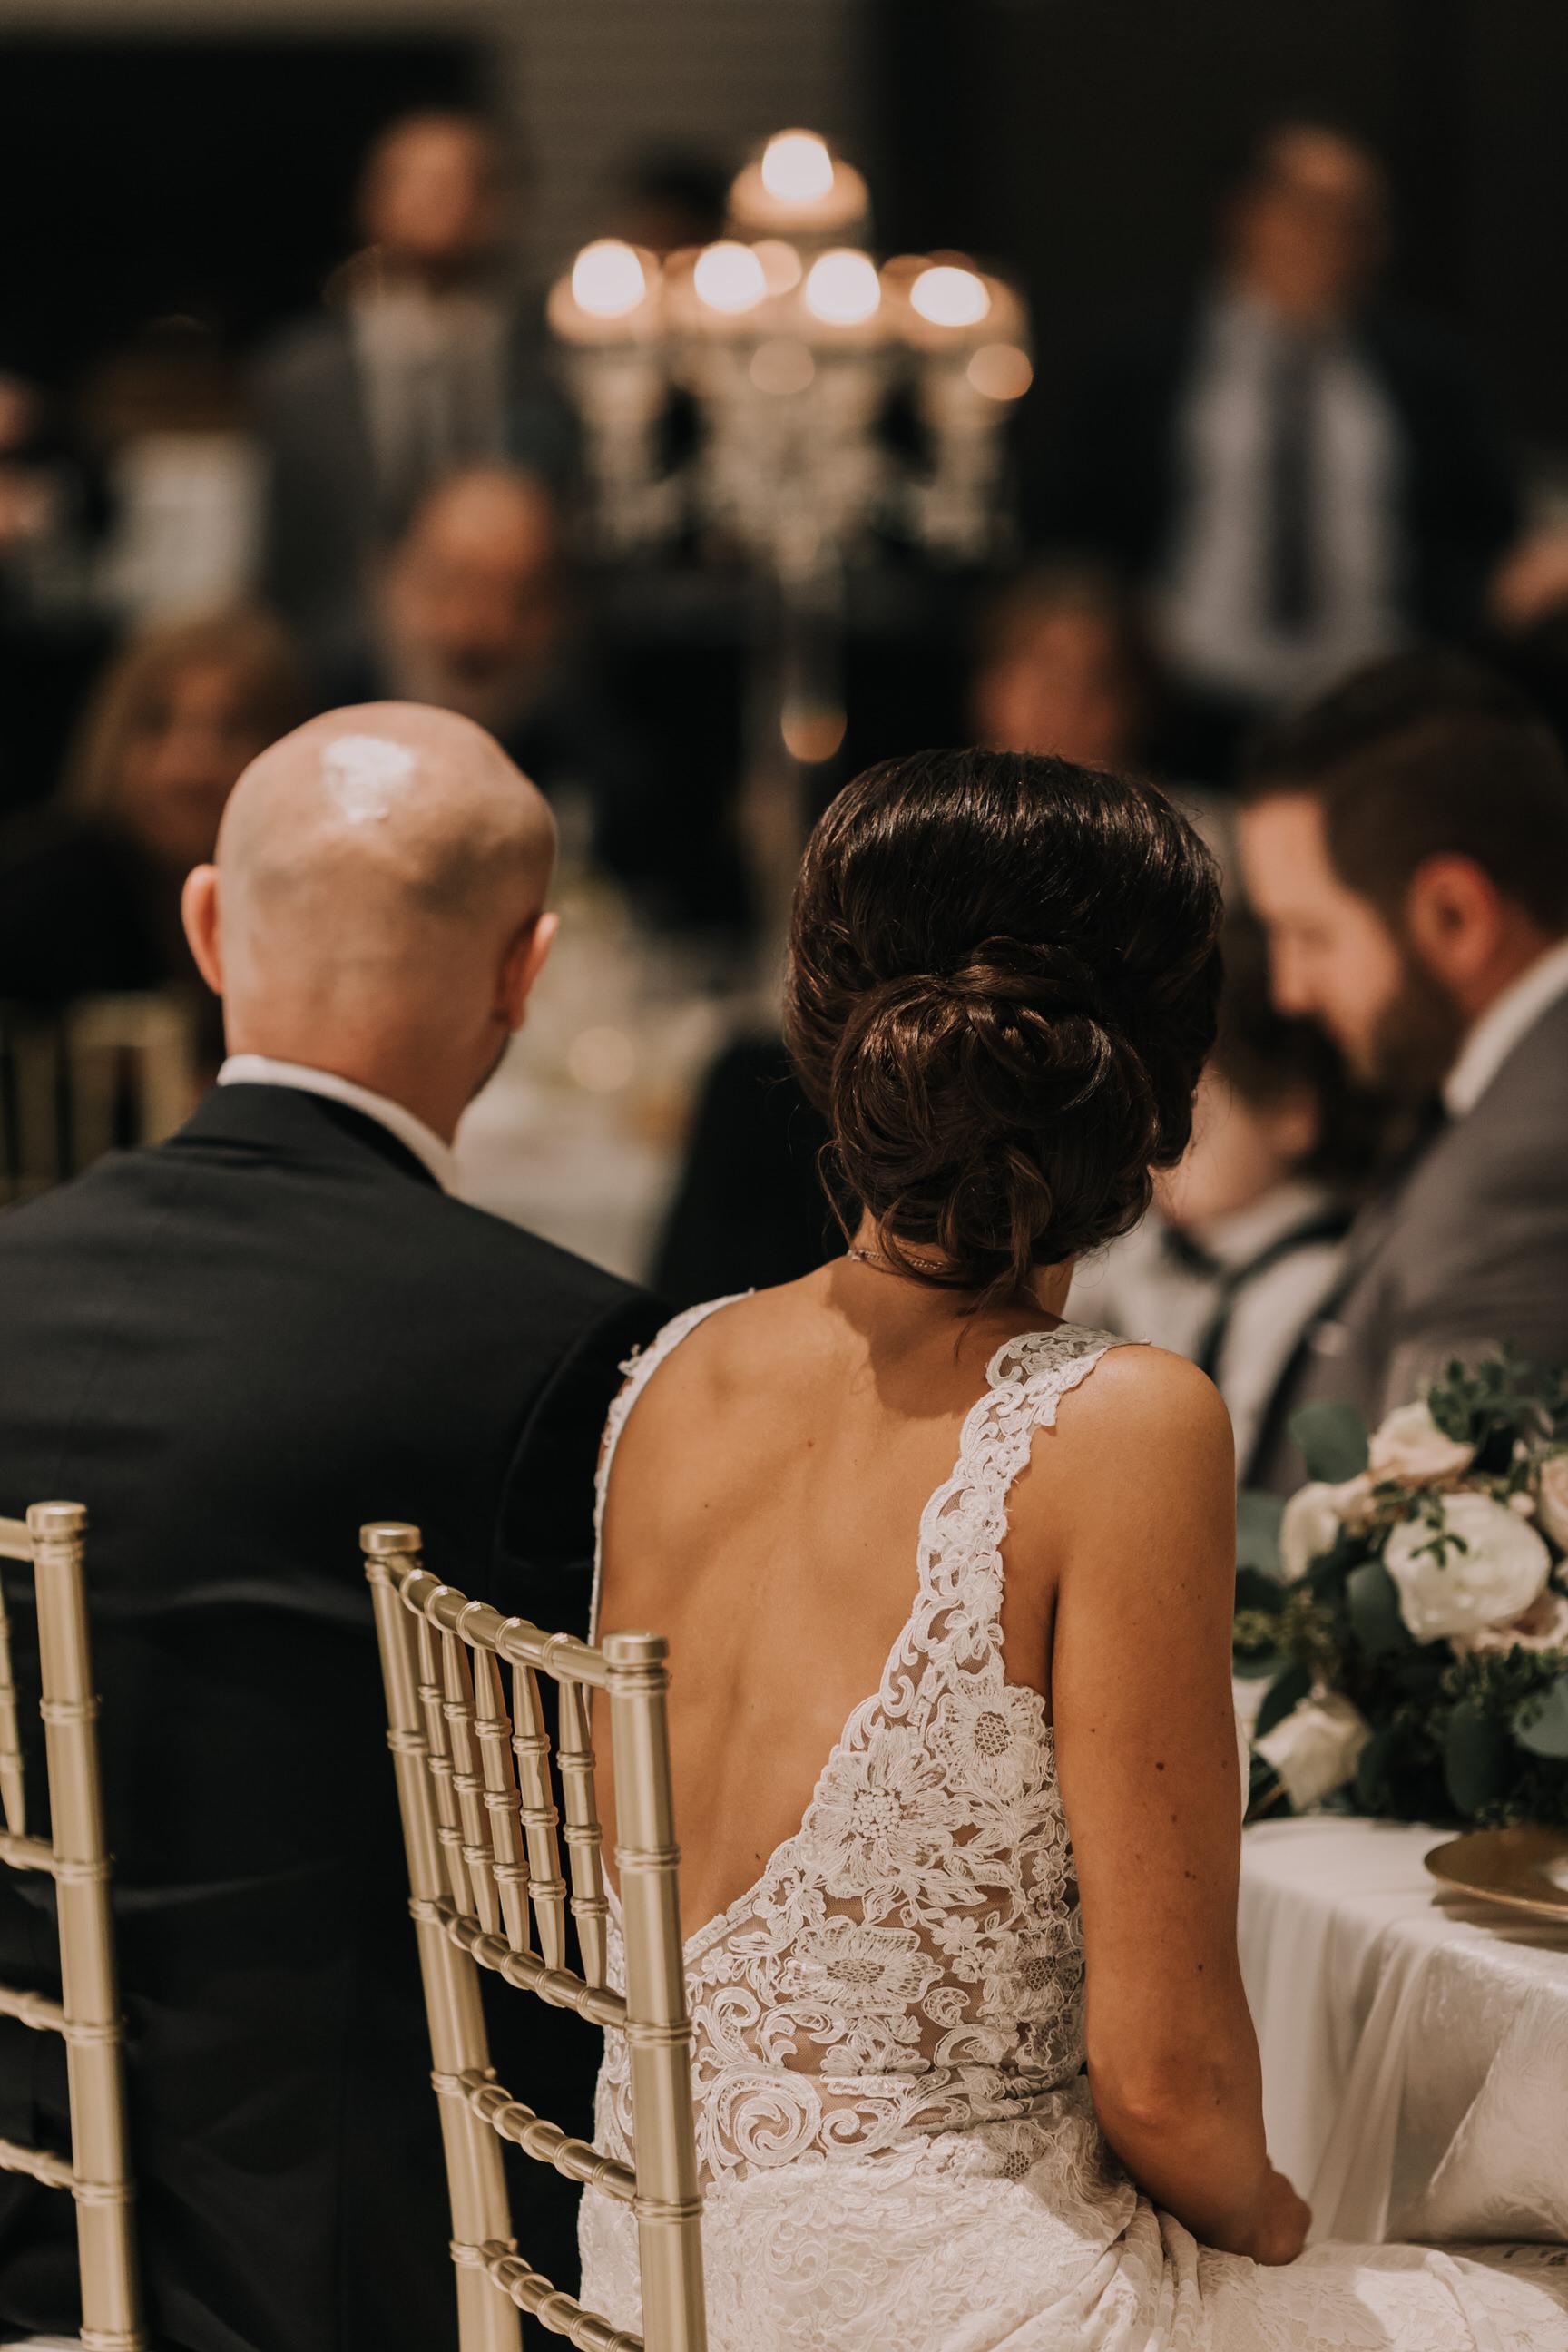 Pitt Meadows Wedding Photographer - Sky Hangar Wedding Photos - Vancouver Wedding Photographer & Videographer - Sunshine Coast Wedding Photos - Sunshine Coast Wedding Photographer - Jennifer Picard Photography - IMG_6290.jpg